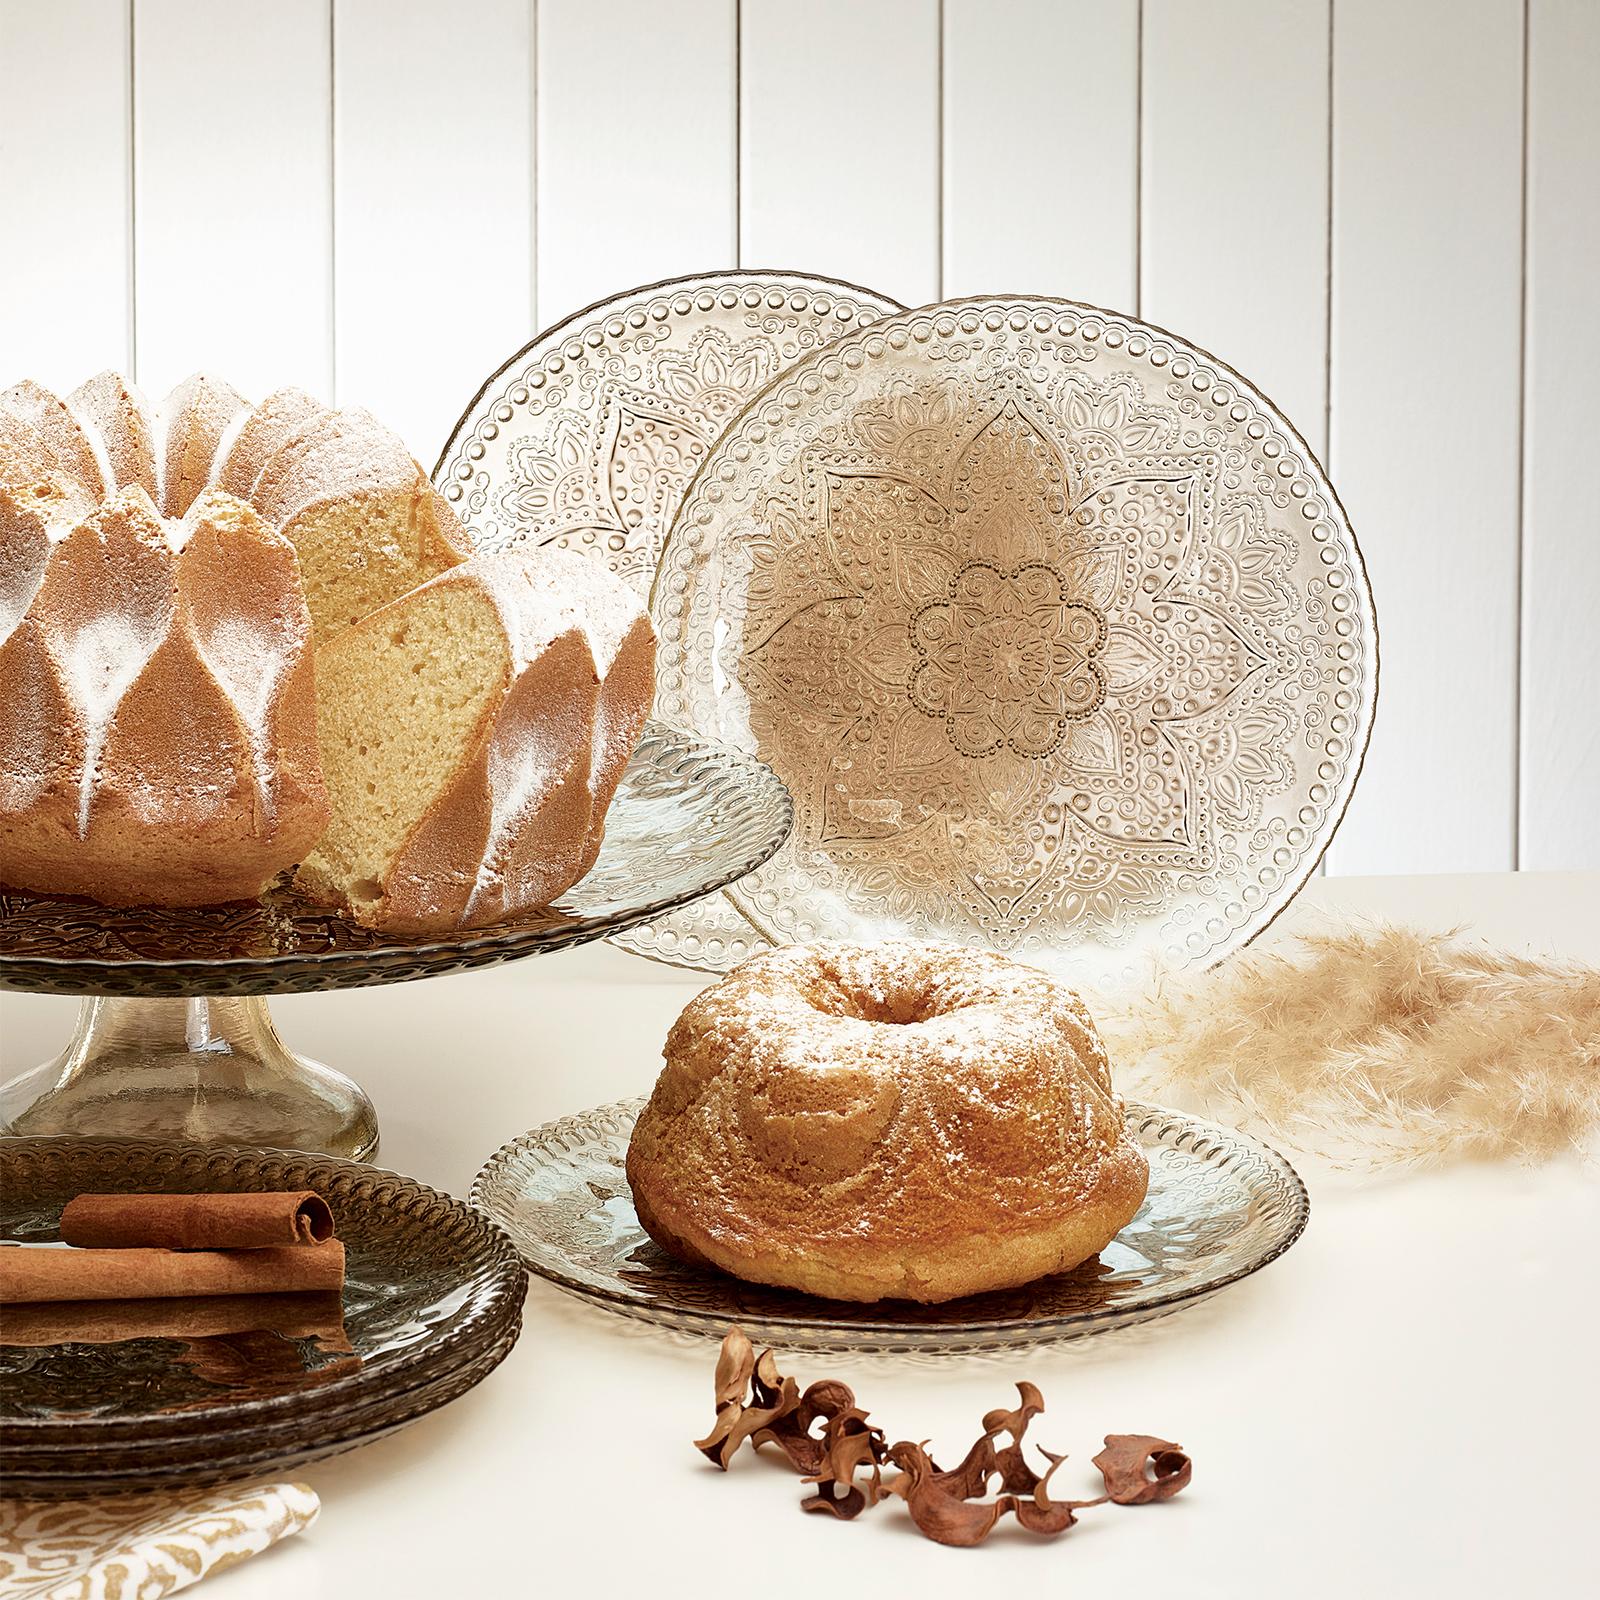 Emsan Semerkant Füme 6 Kişilik Kek/Pasta Seti